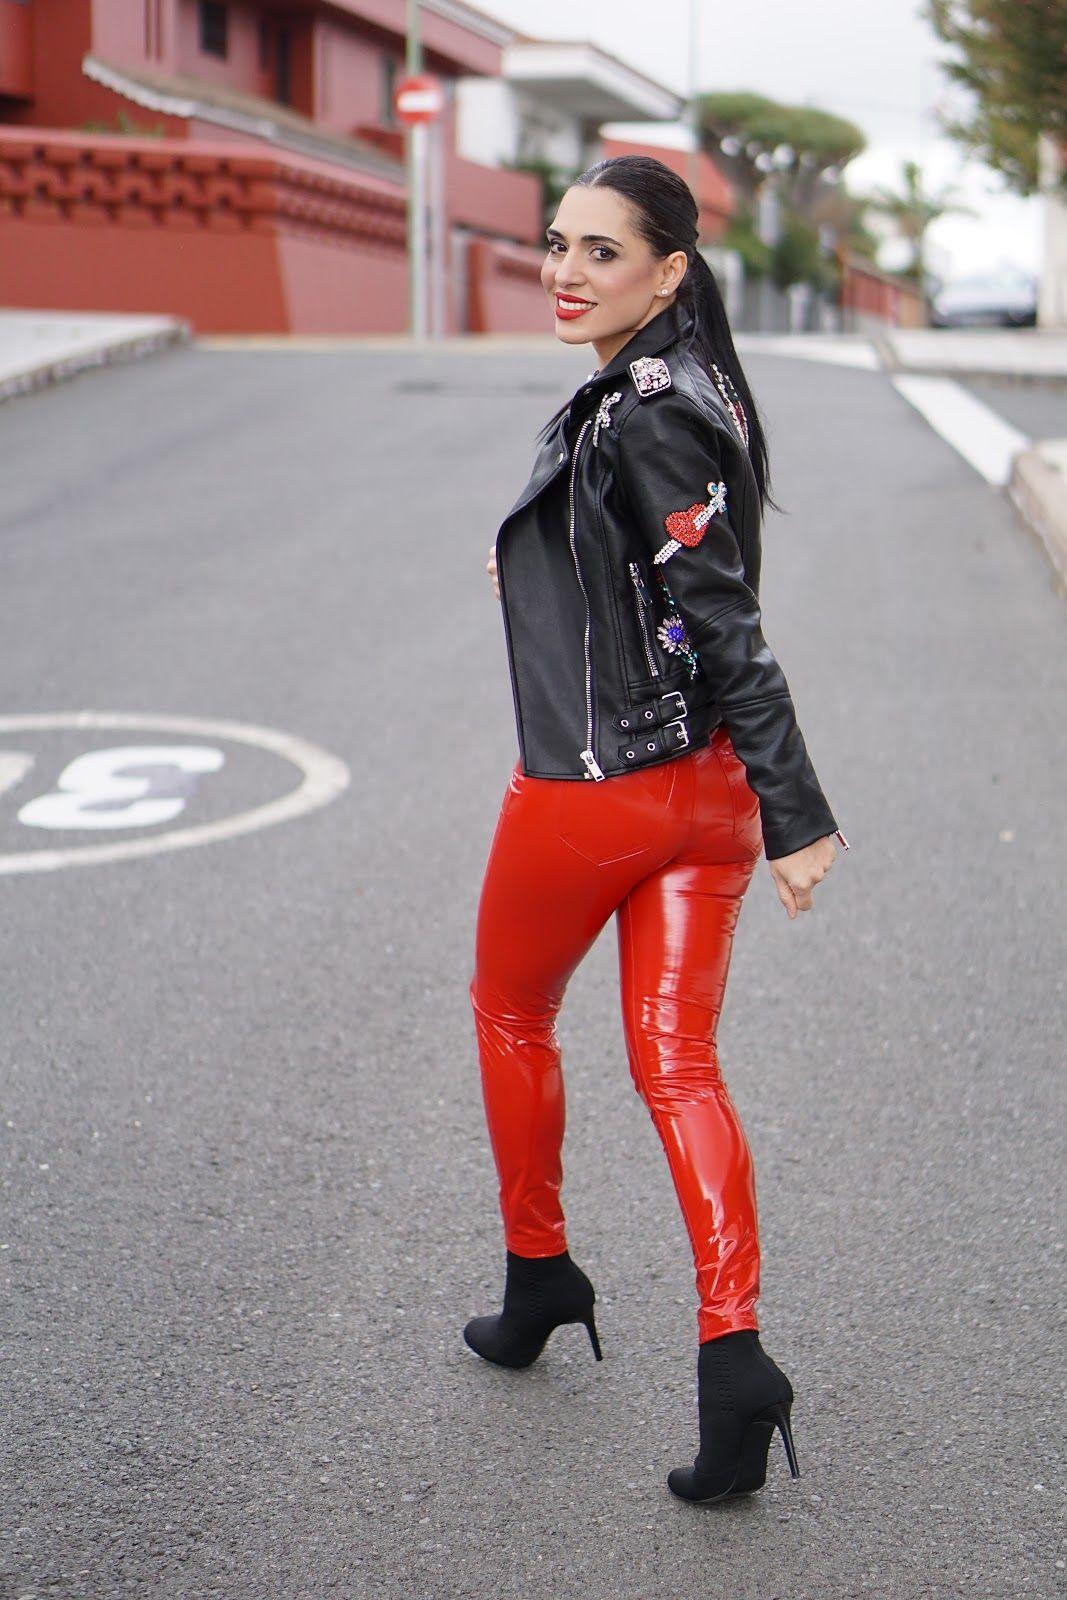 43c92e5708397 Shiny Leggings, Leggings Are Not Pants, Latex Fashion, Fashion Tights,  Girls Heels